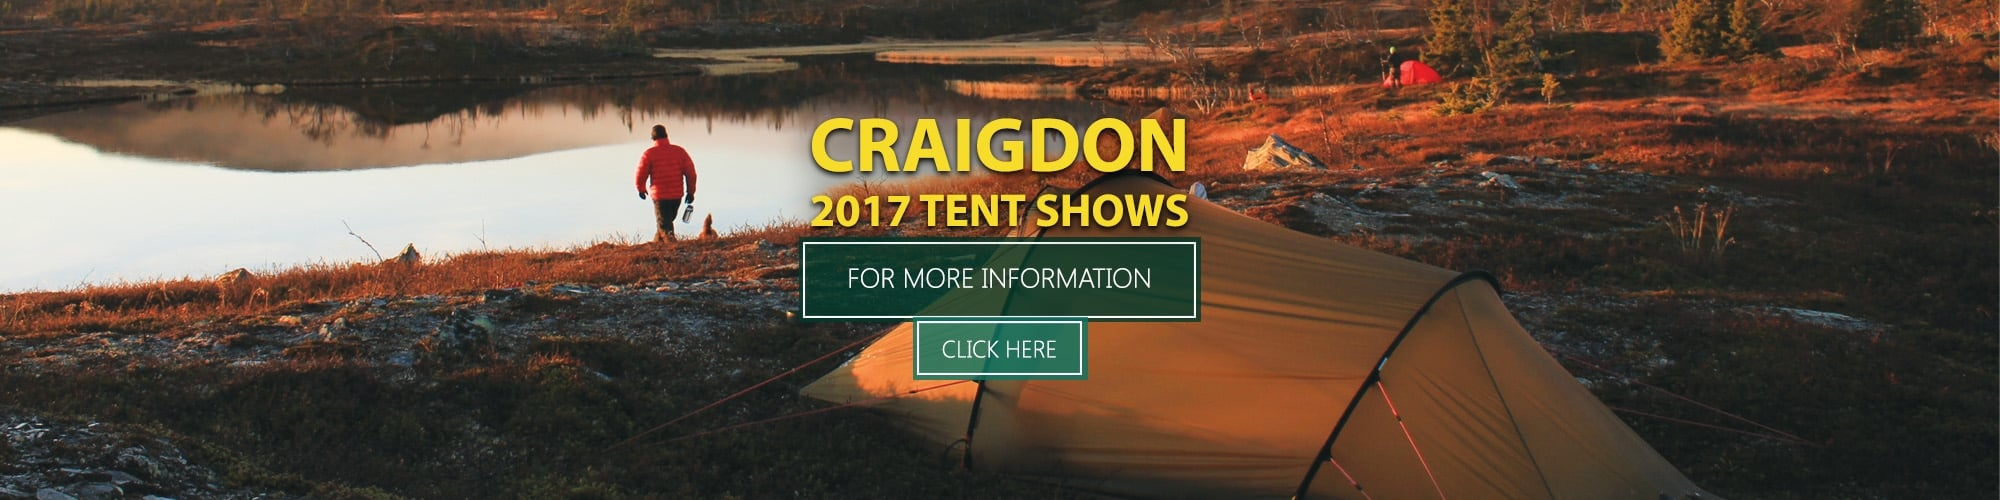 Craigdon 2017 Tent Shows